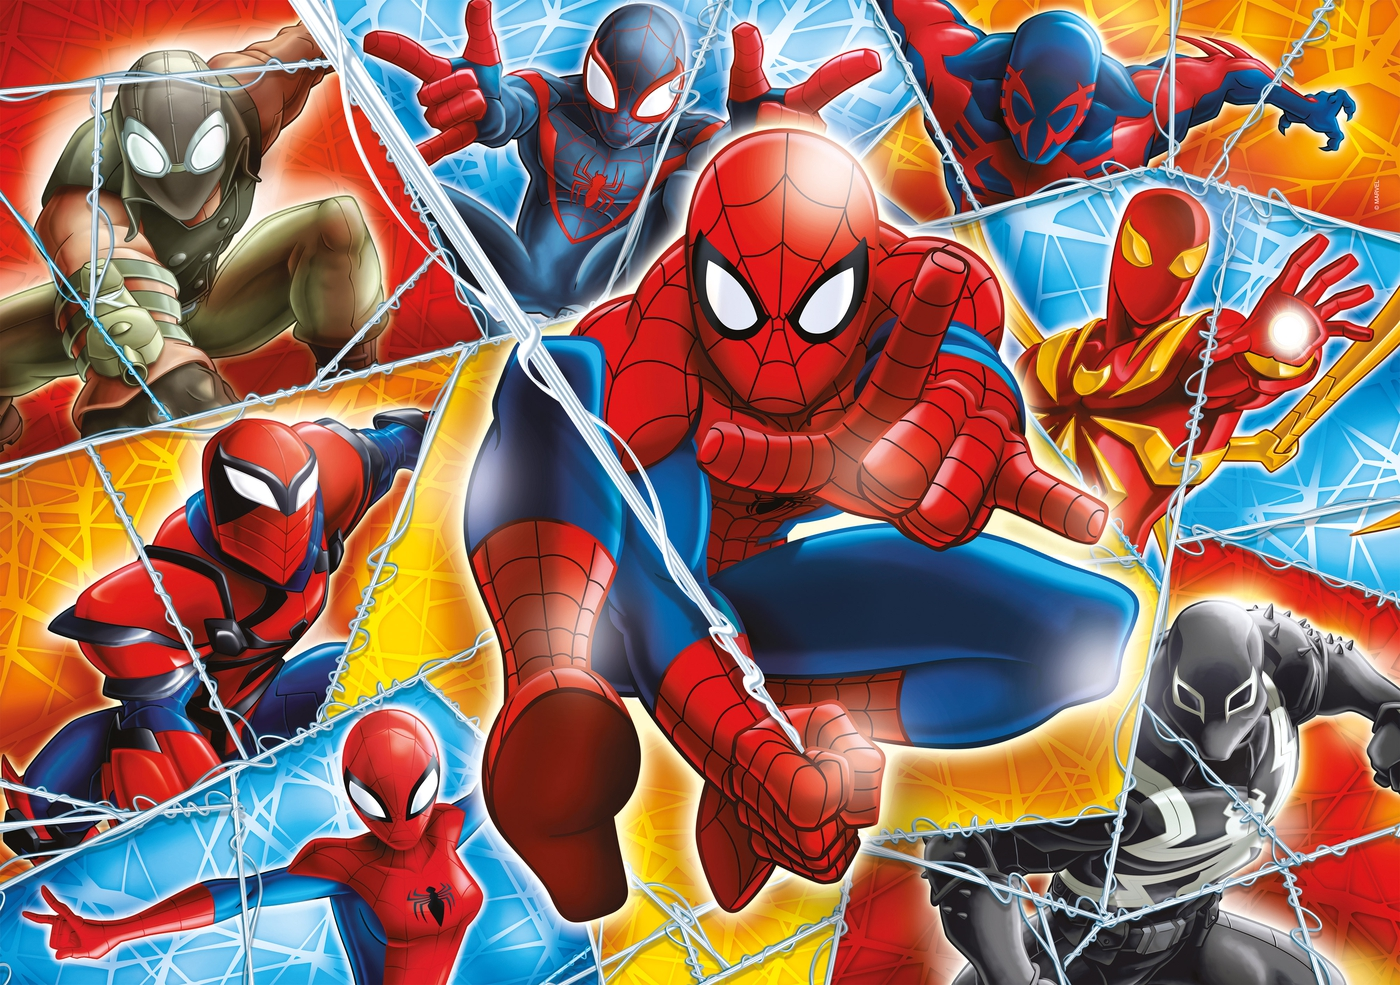 MARVEL UNIVERSE ULTIMATE SPIDER-MAN: WEB WARRIORS (2014